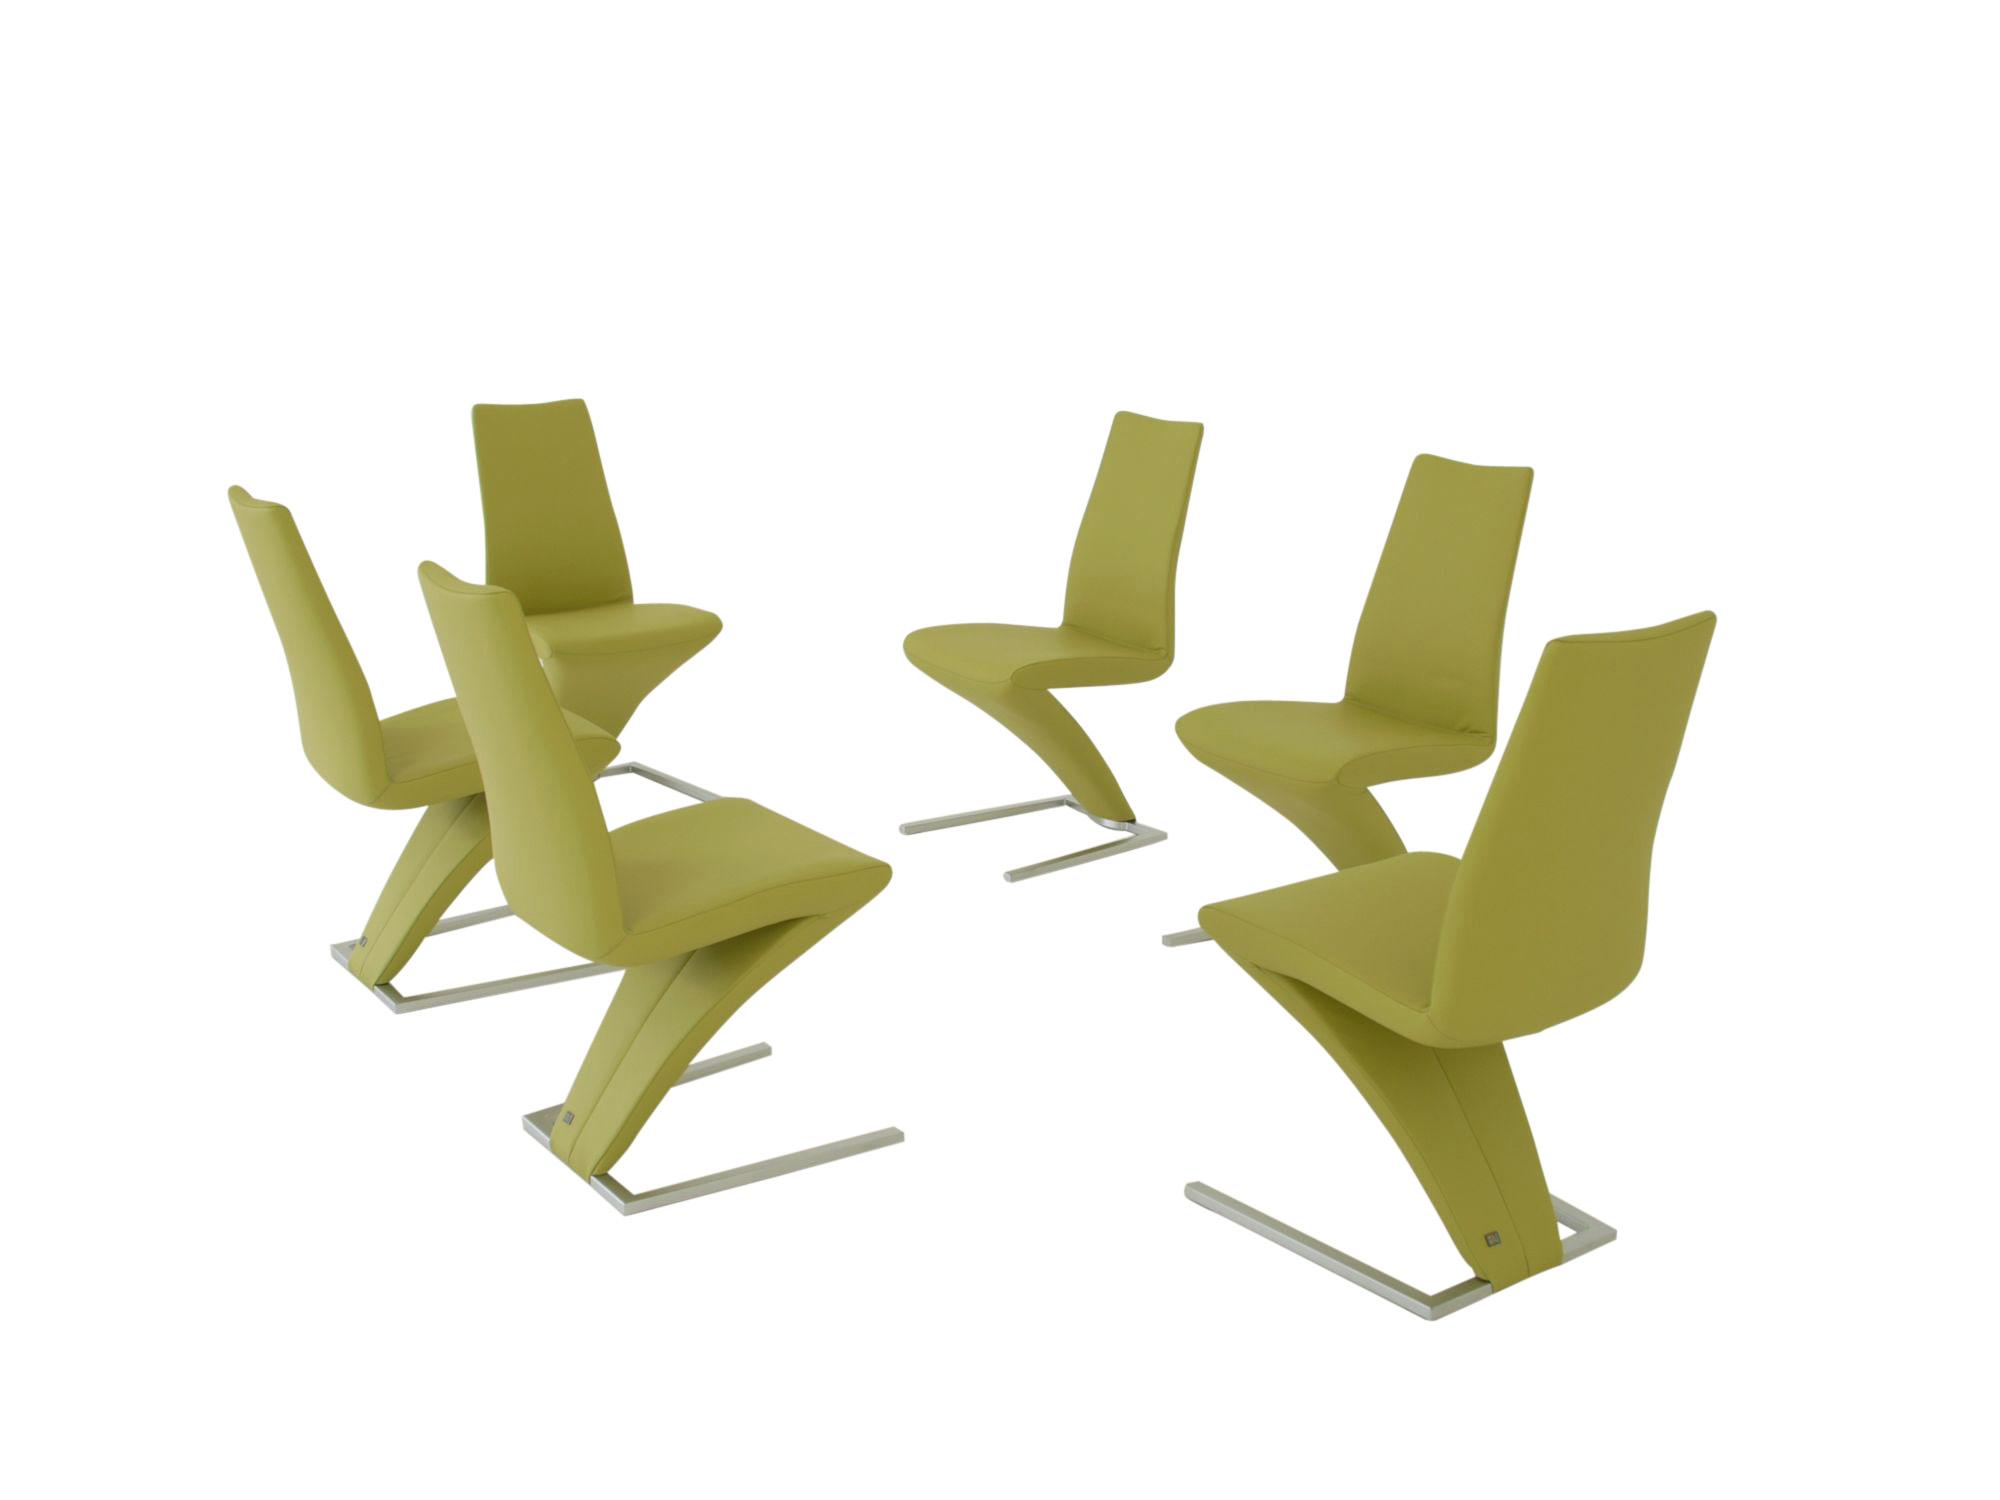 Rolf Benz 7800 Stühle in Leder grün ab Lager lieferbar